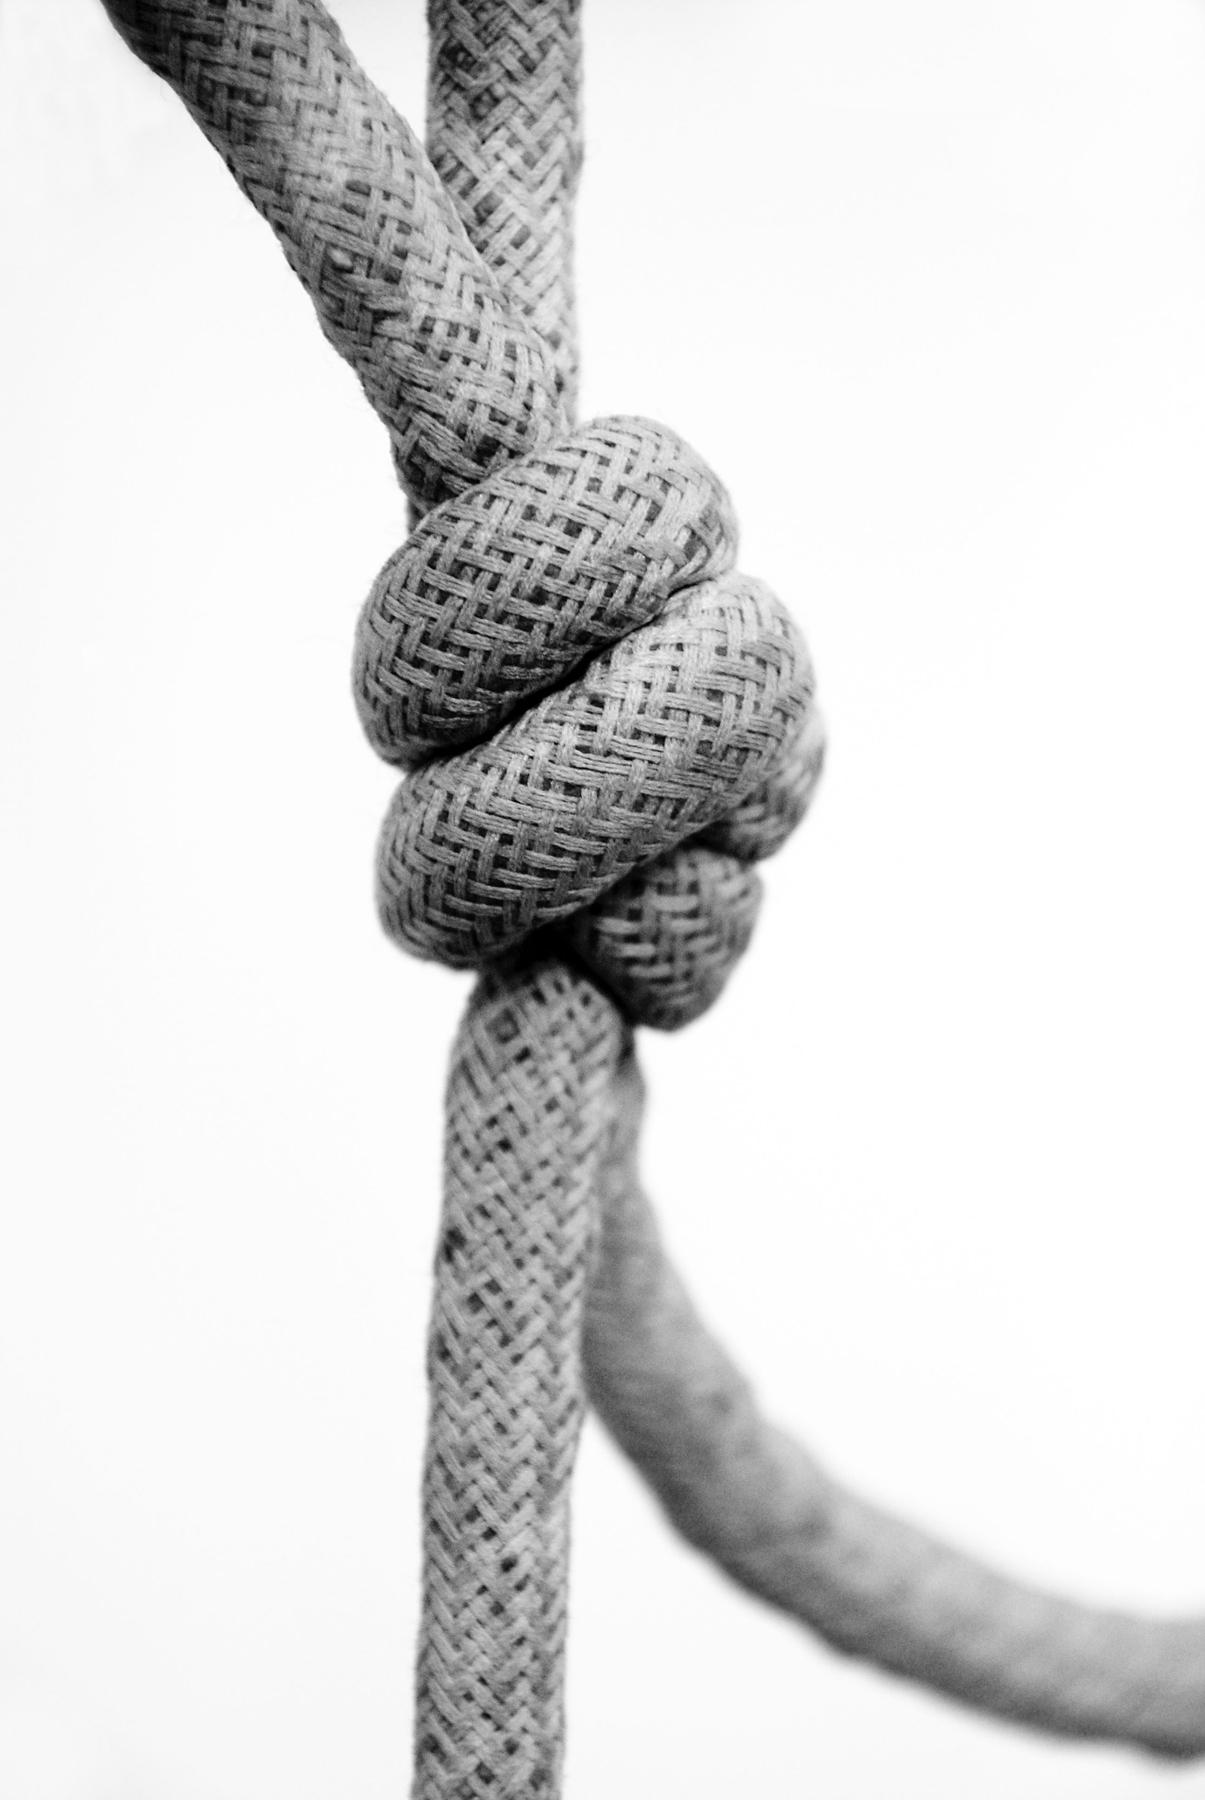 Loosening the legislative noose